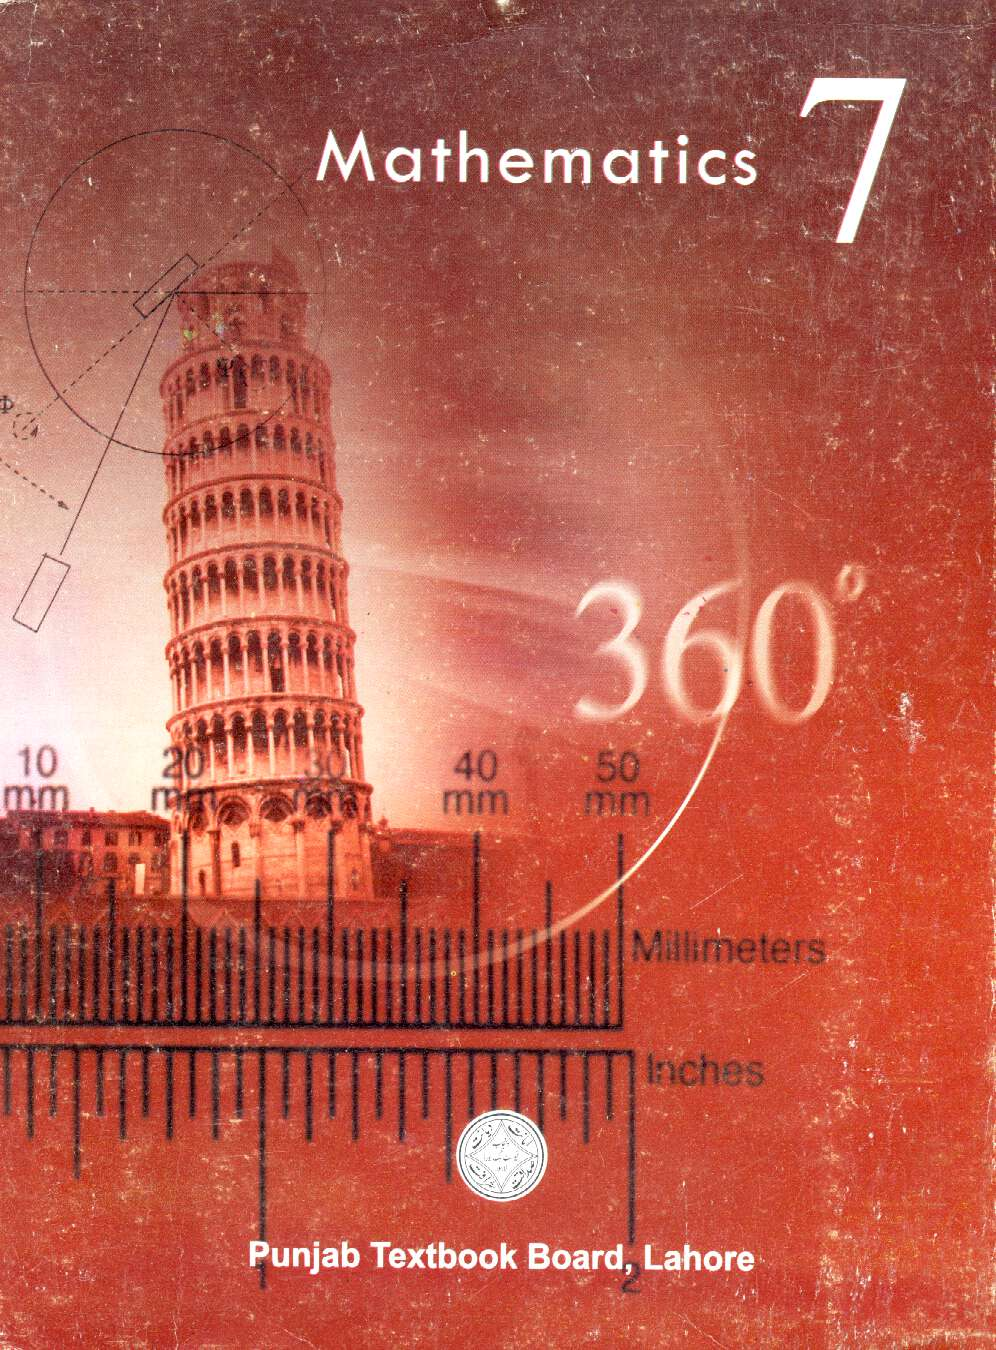 Mathematics 7th